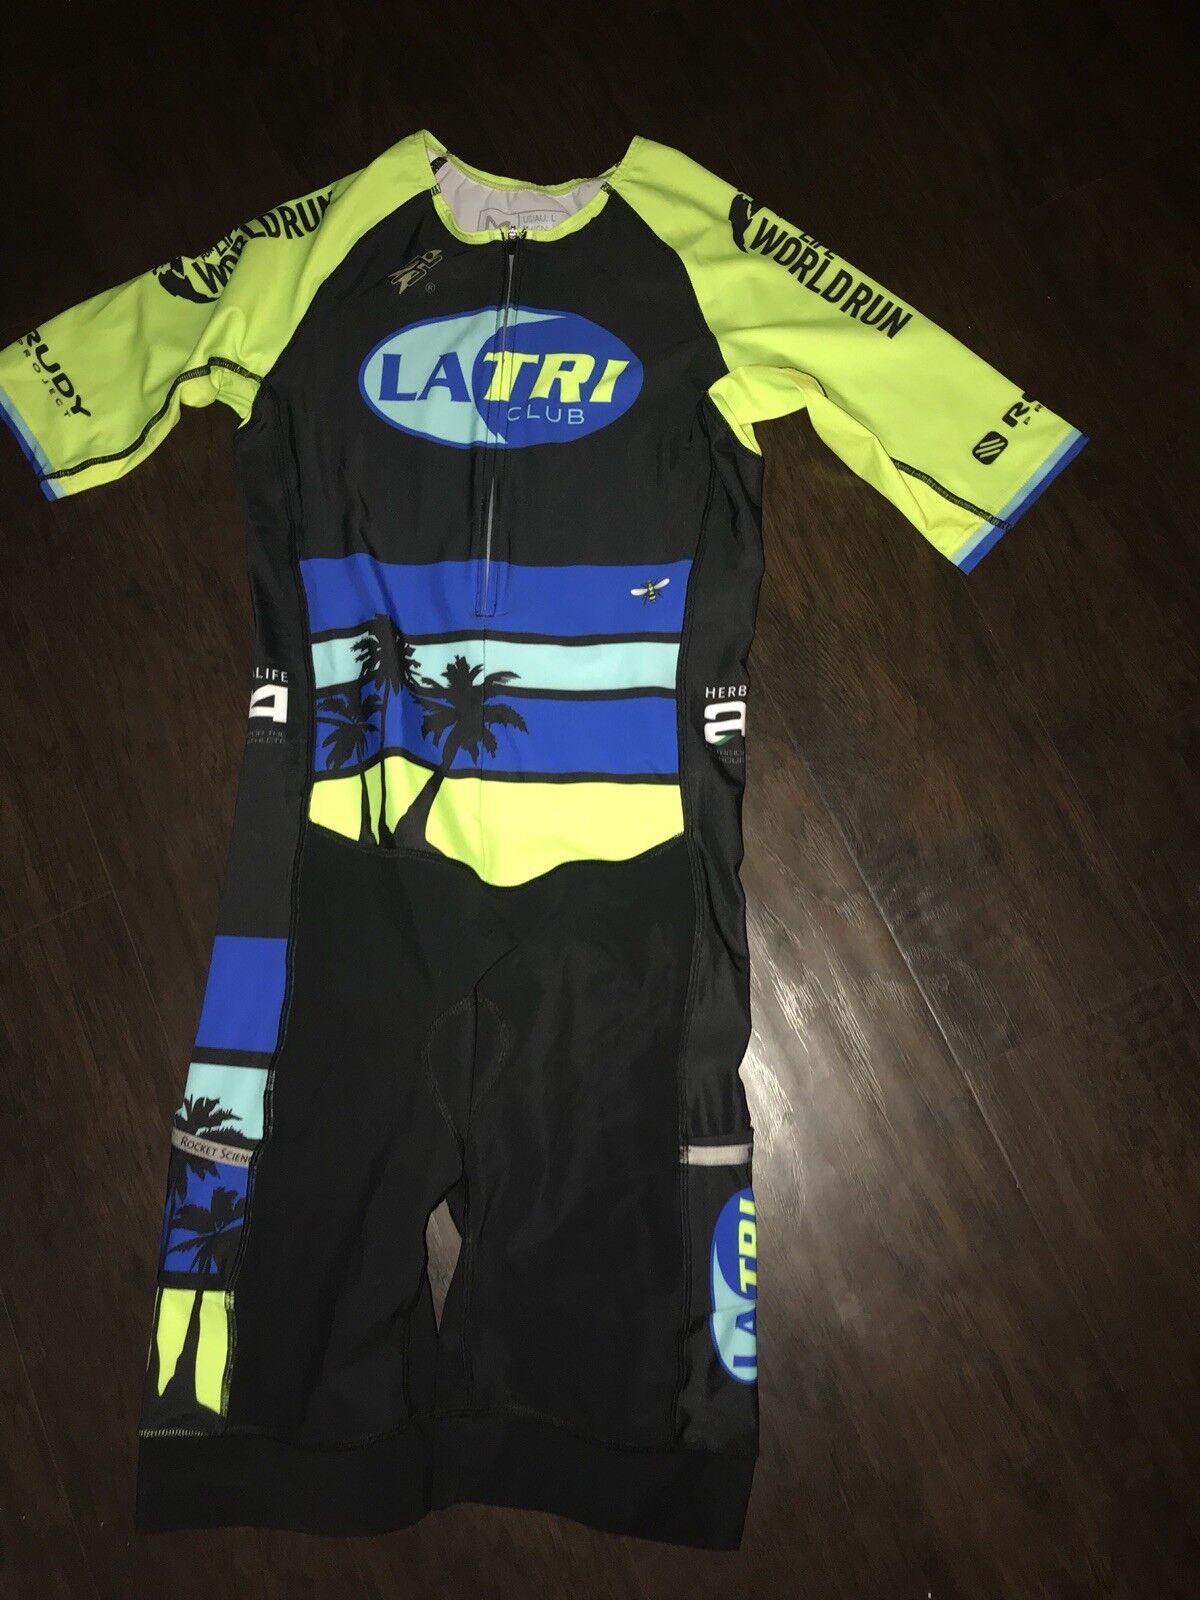 Uomo's Cycling Angeles Skinsuit Speedsuit Large L Los Angeles Cycling LA Triathlon Club Nuovo b251aa